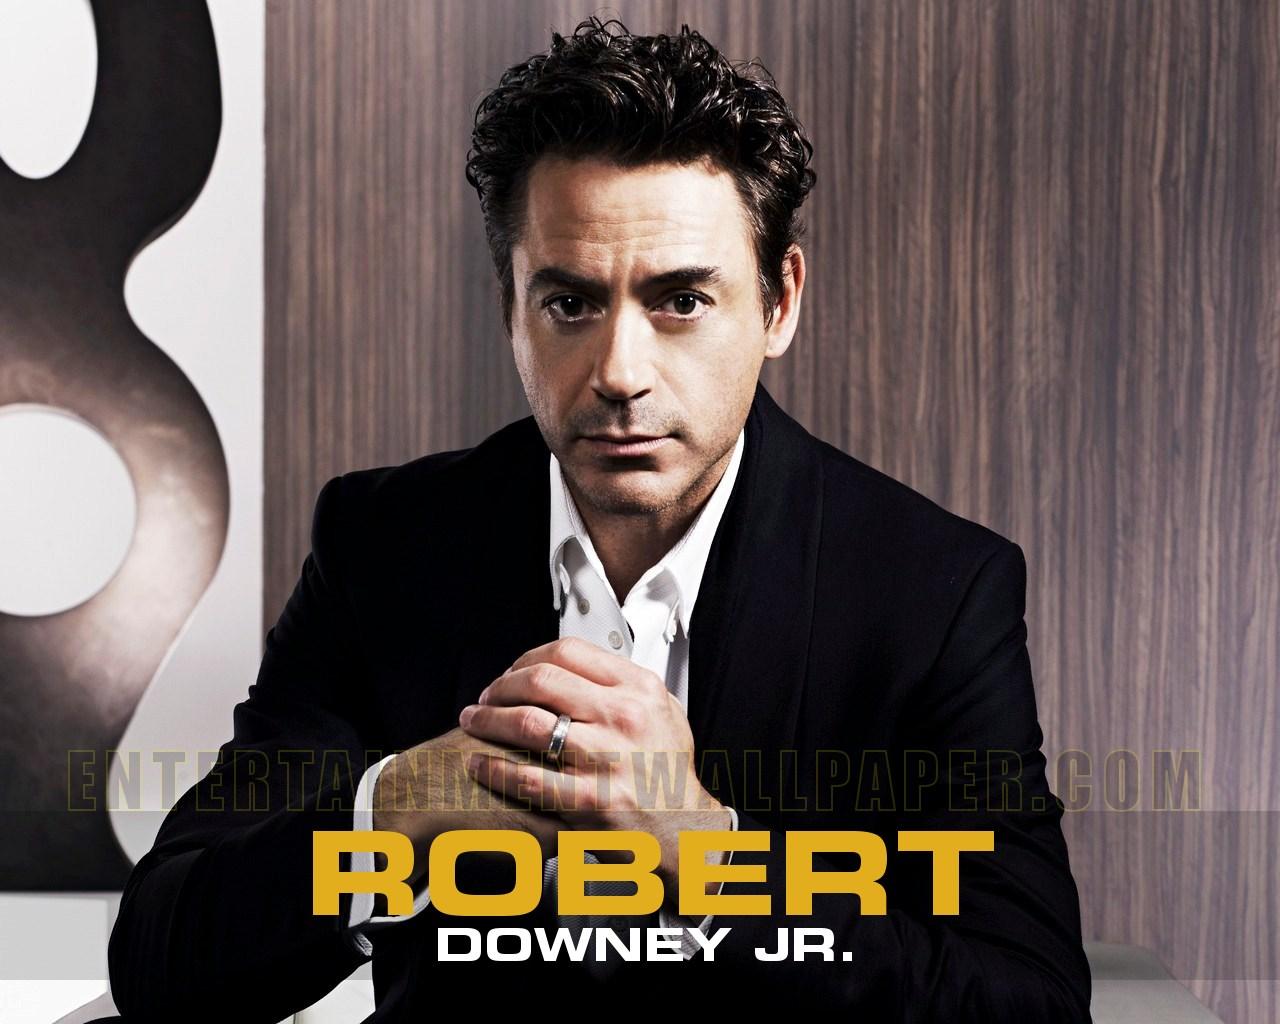 http://2.bp.blogspot.com/-WqW8W-JVQ2w/UC0qj17szAI/AAAAAAAAKCA/YfoAJwgckAk/s1600/Robert-Downey-Jr-iron-man-3-marvel.jpg